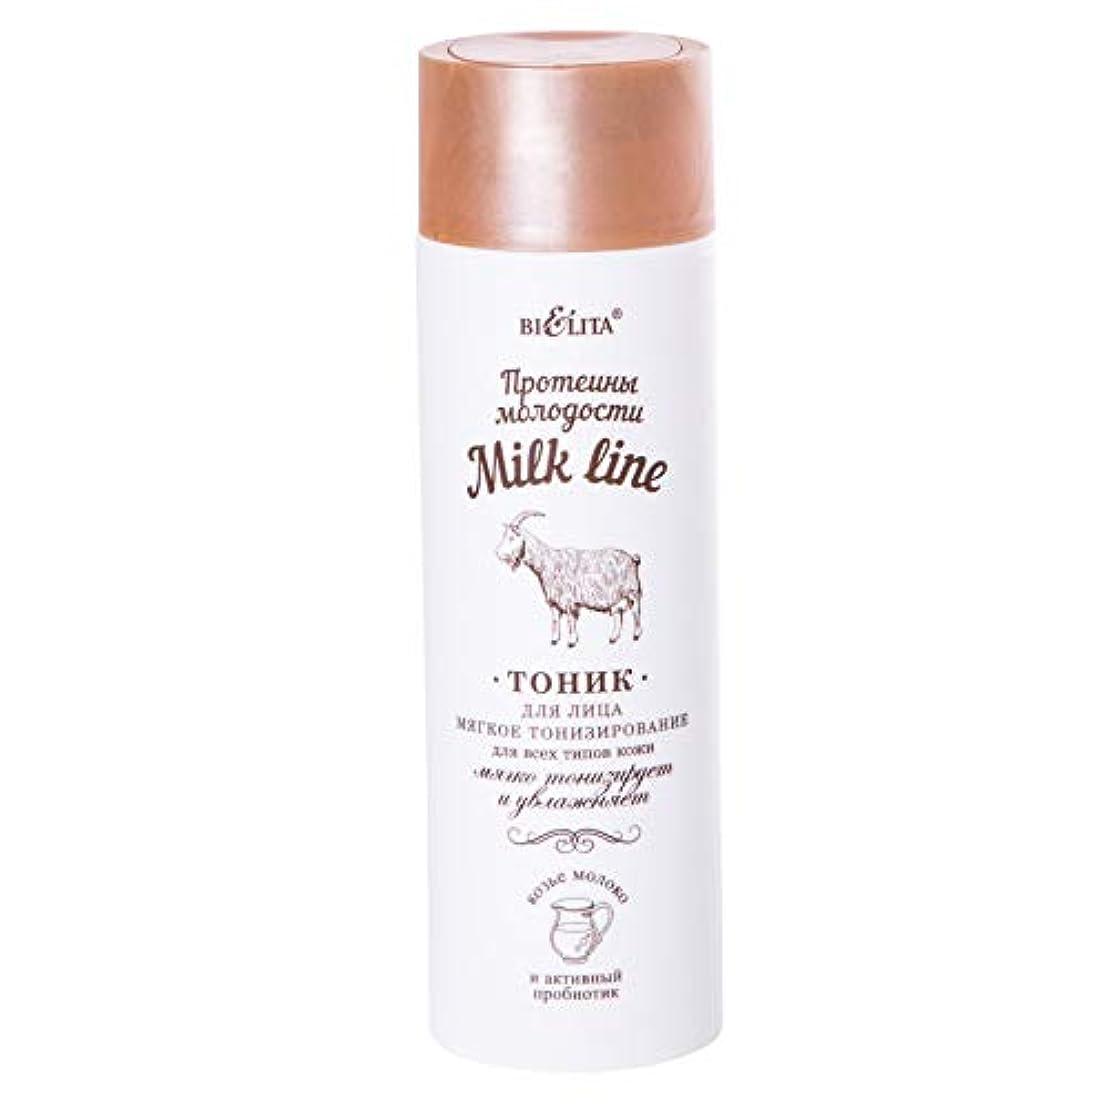 Bielita & Vitex | Milk Line | Facial Toner SOFT TONING for all skin types | Goat Milk Proteins | Toniskin | Vitamins...